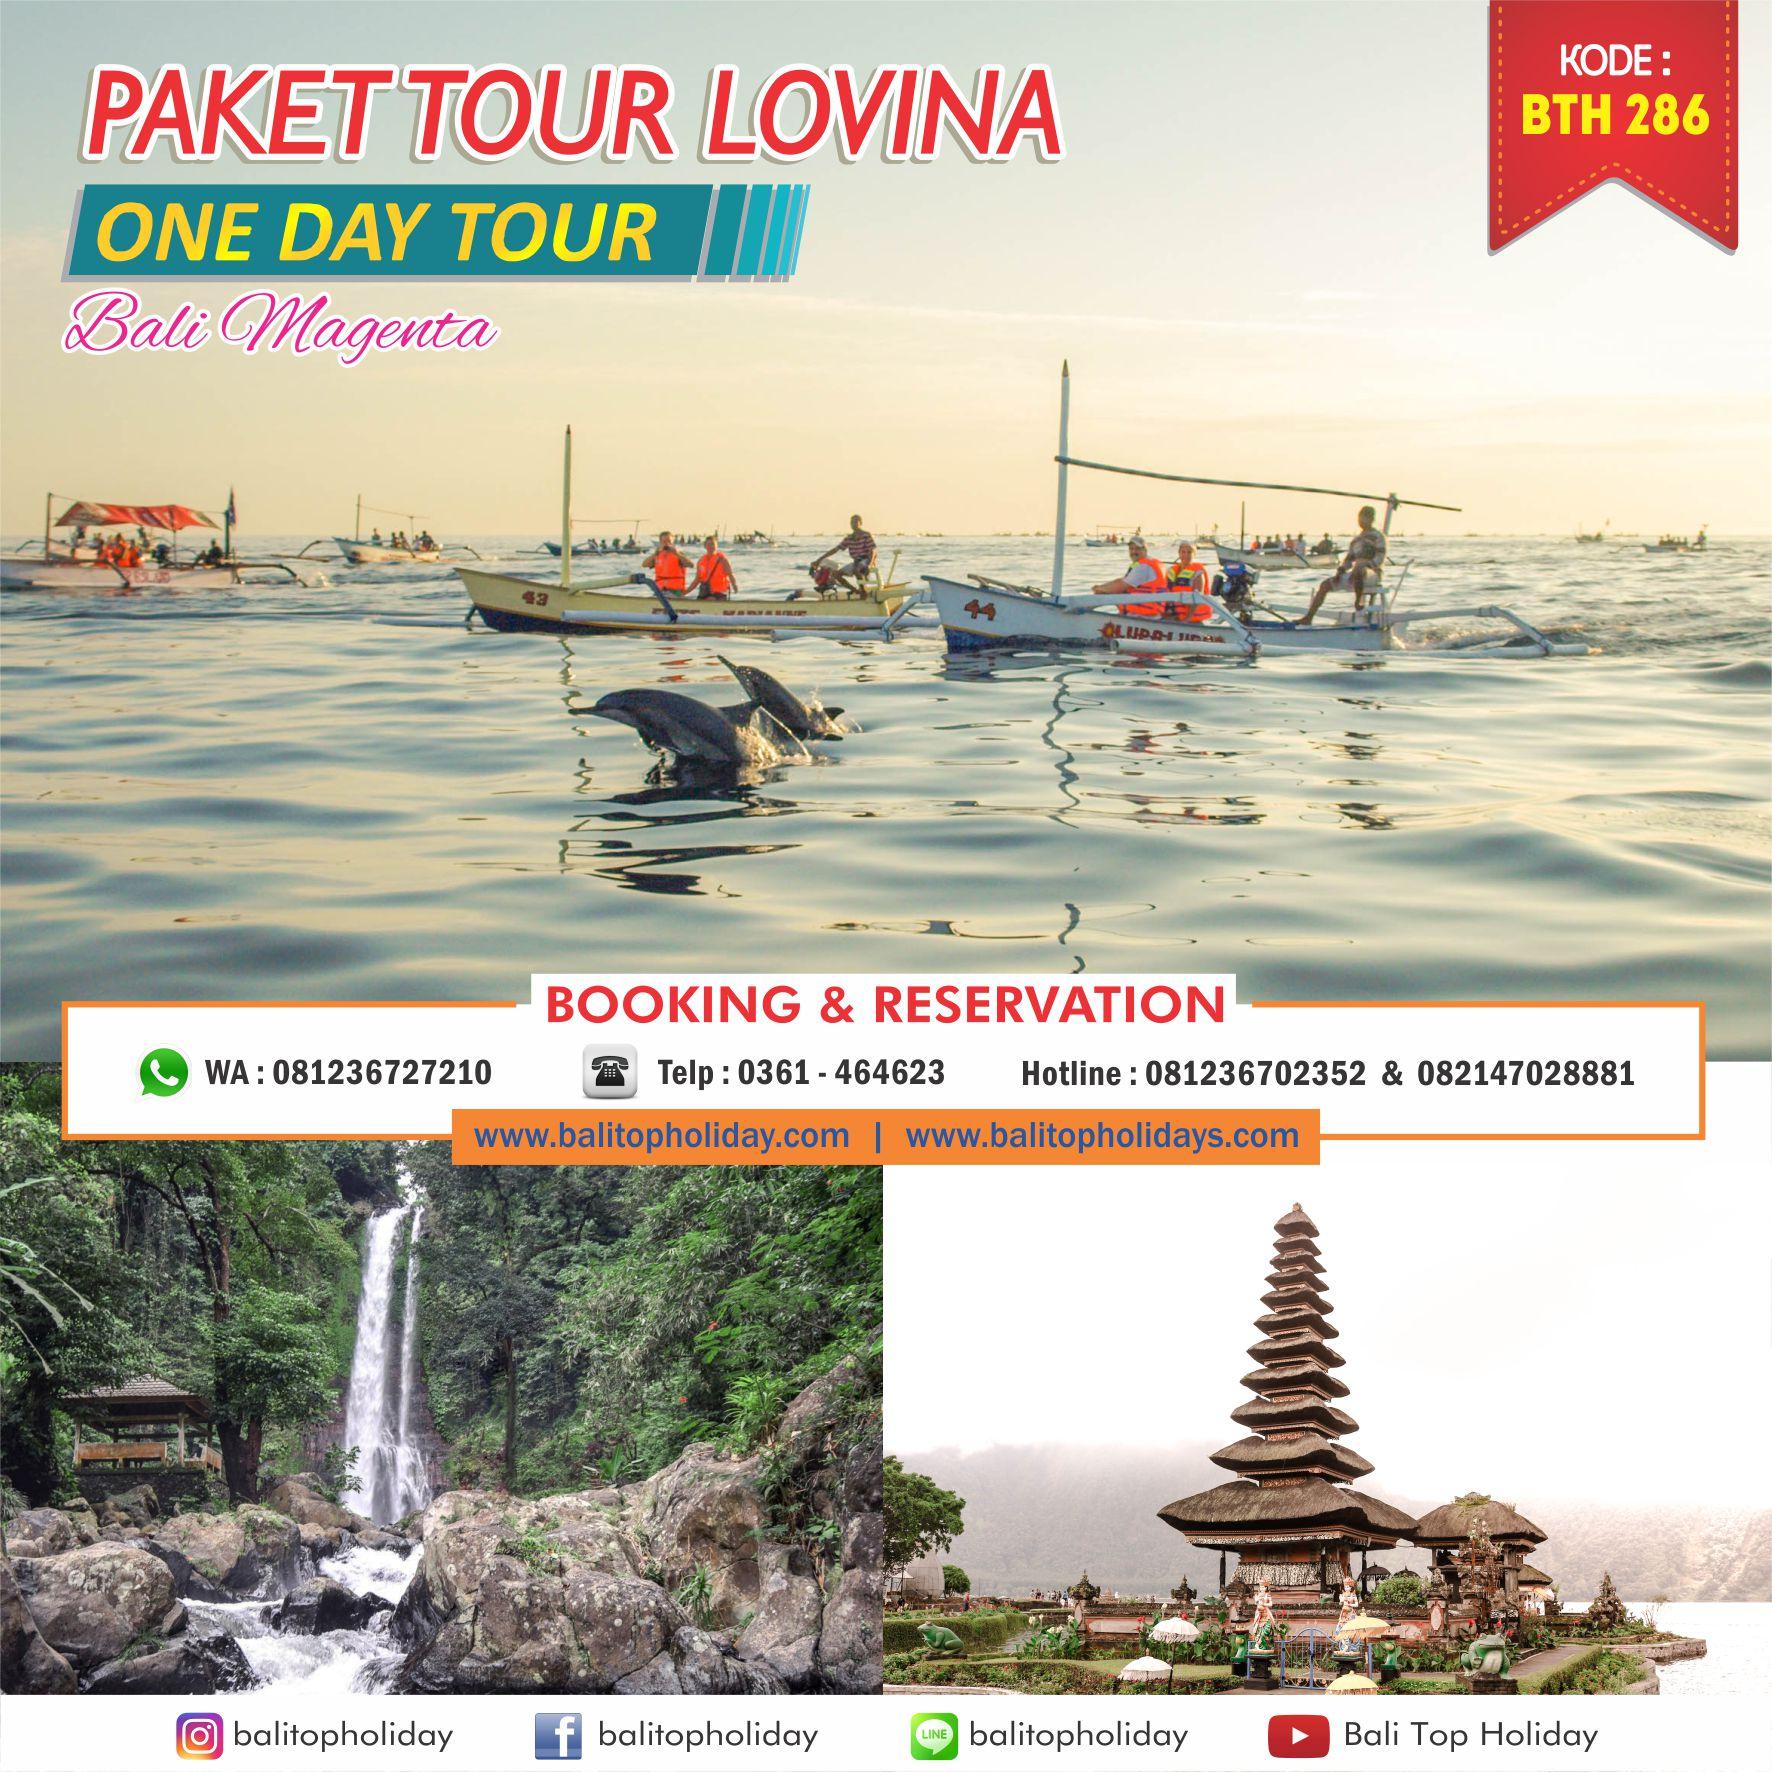 Paket Tour Lovina 1 Hari